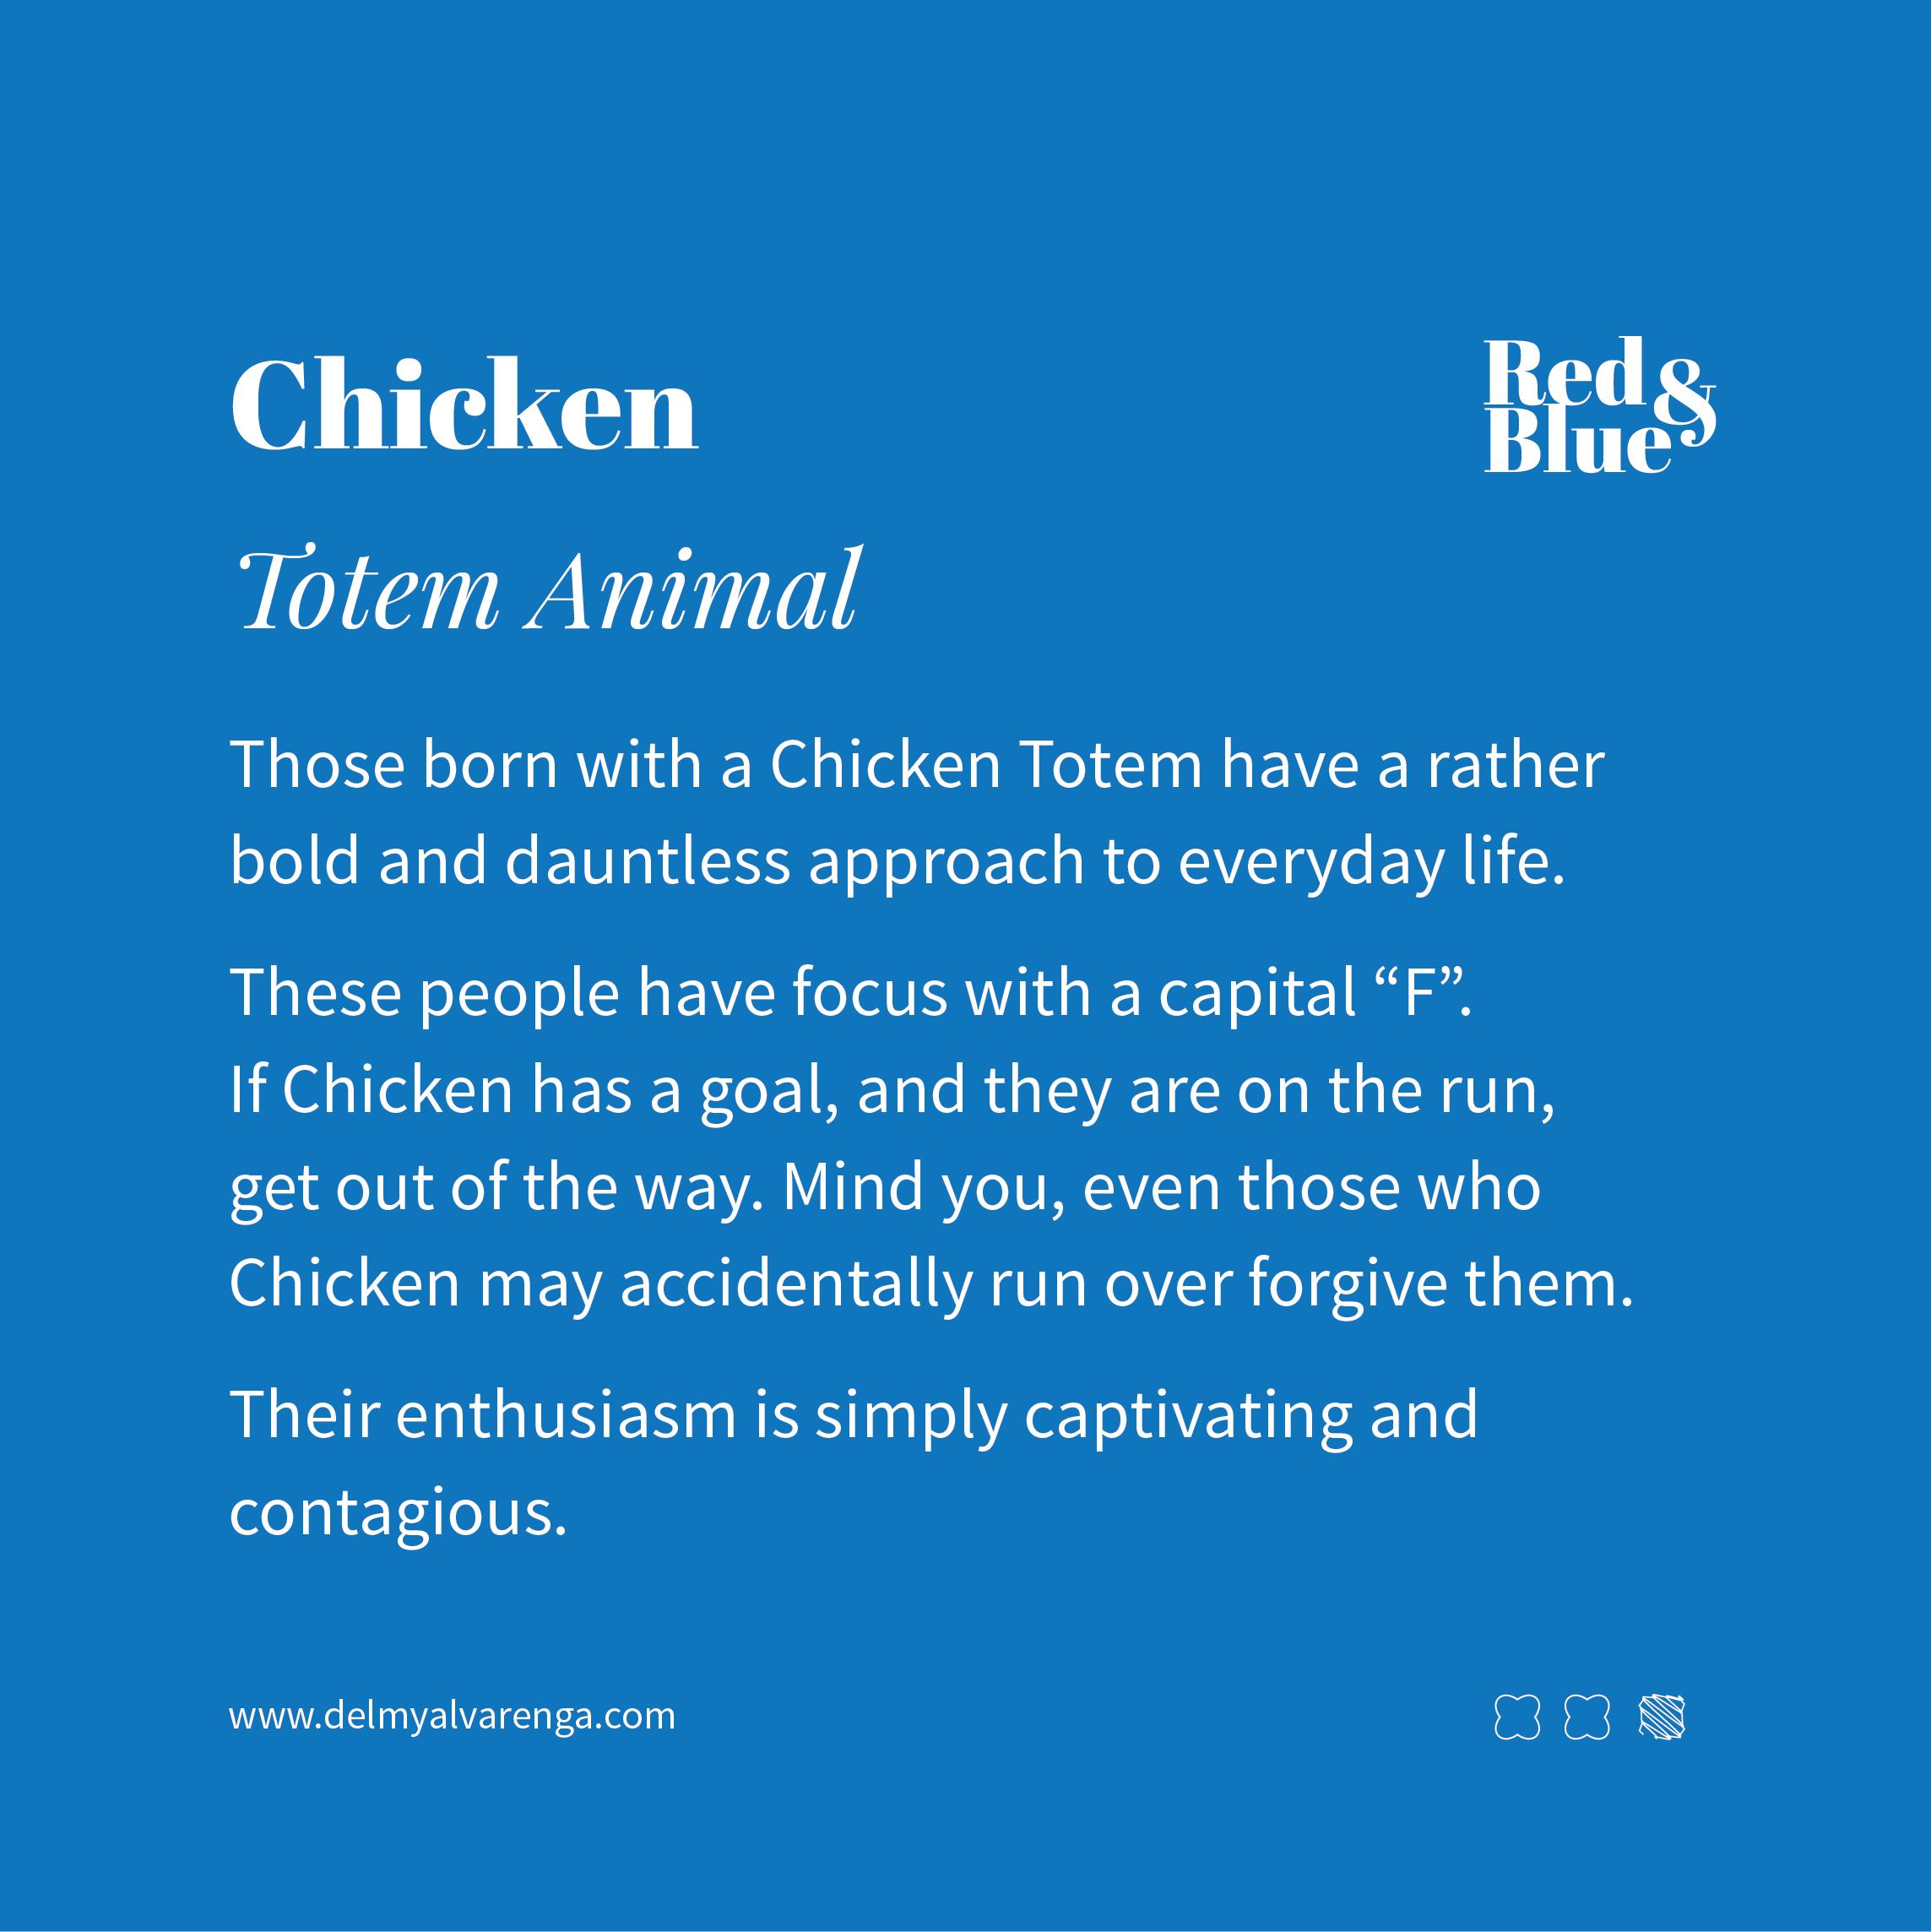 Chicken Totem Animal